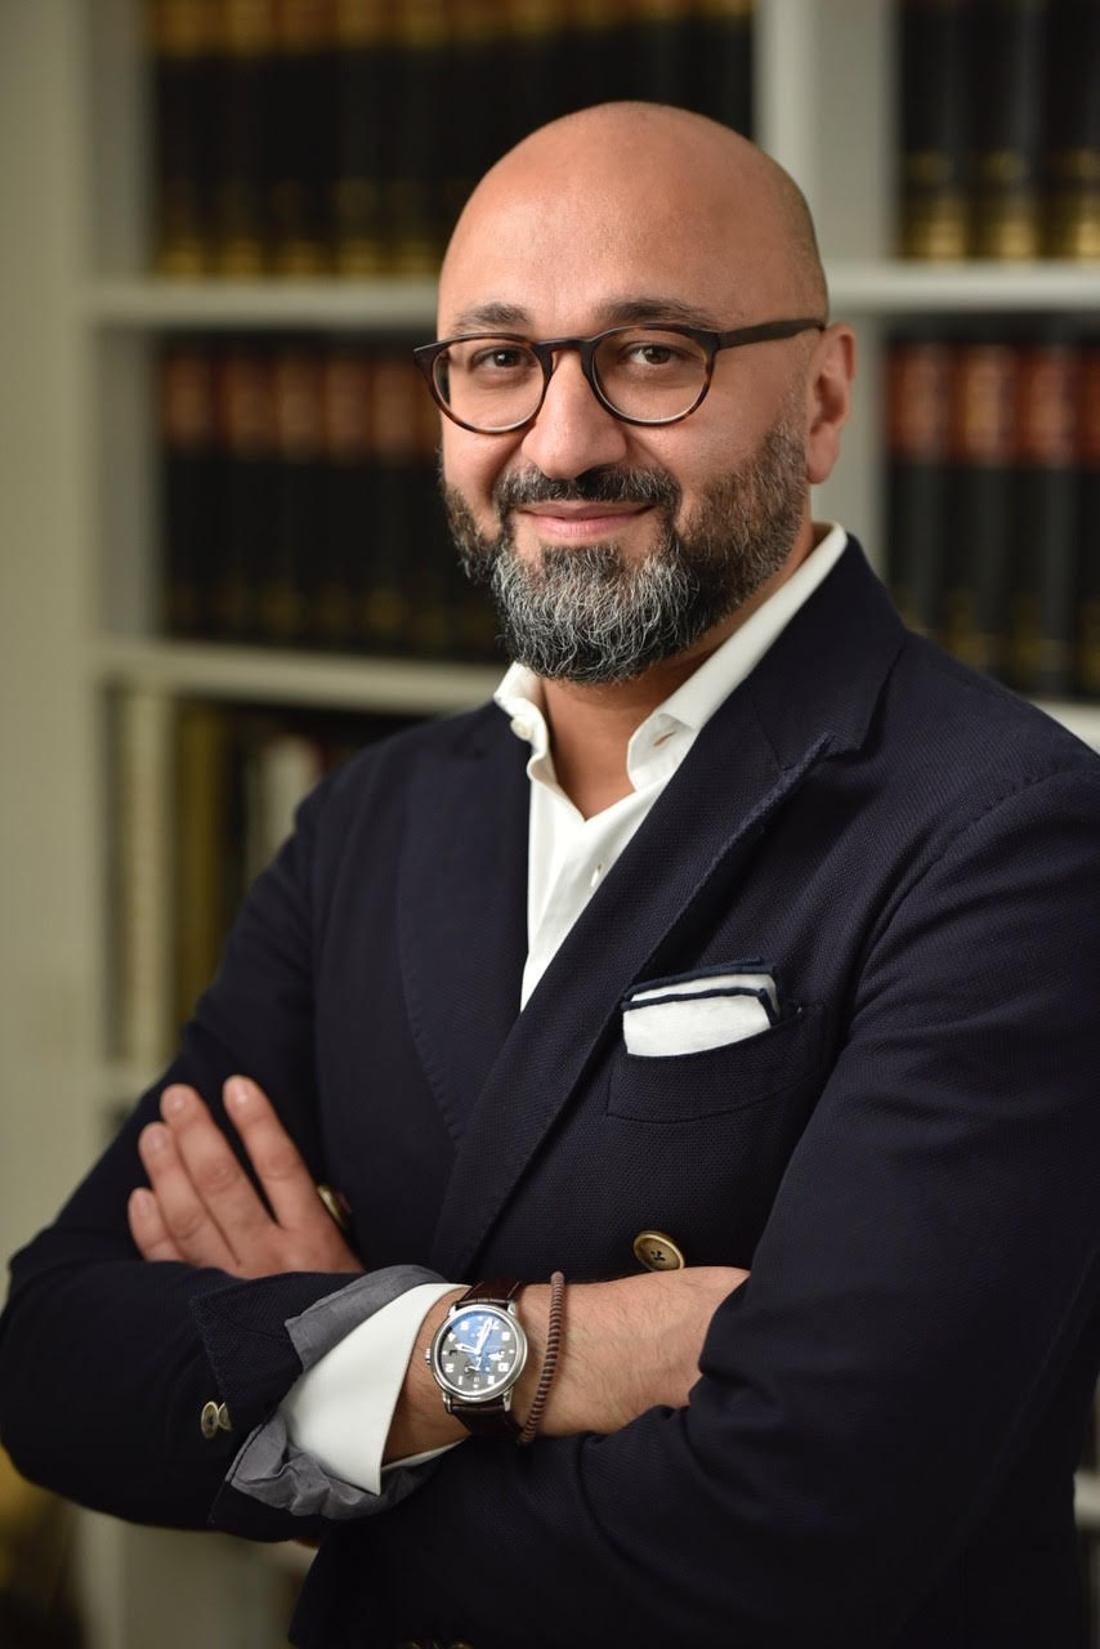 Pedram Emami Präsident Hamburger Ärztekammer